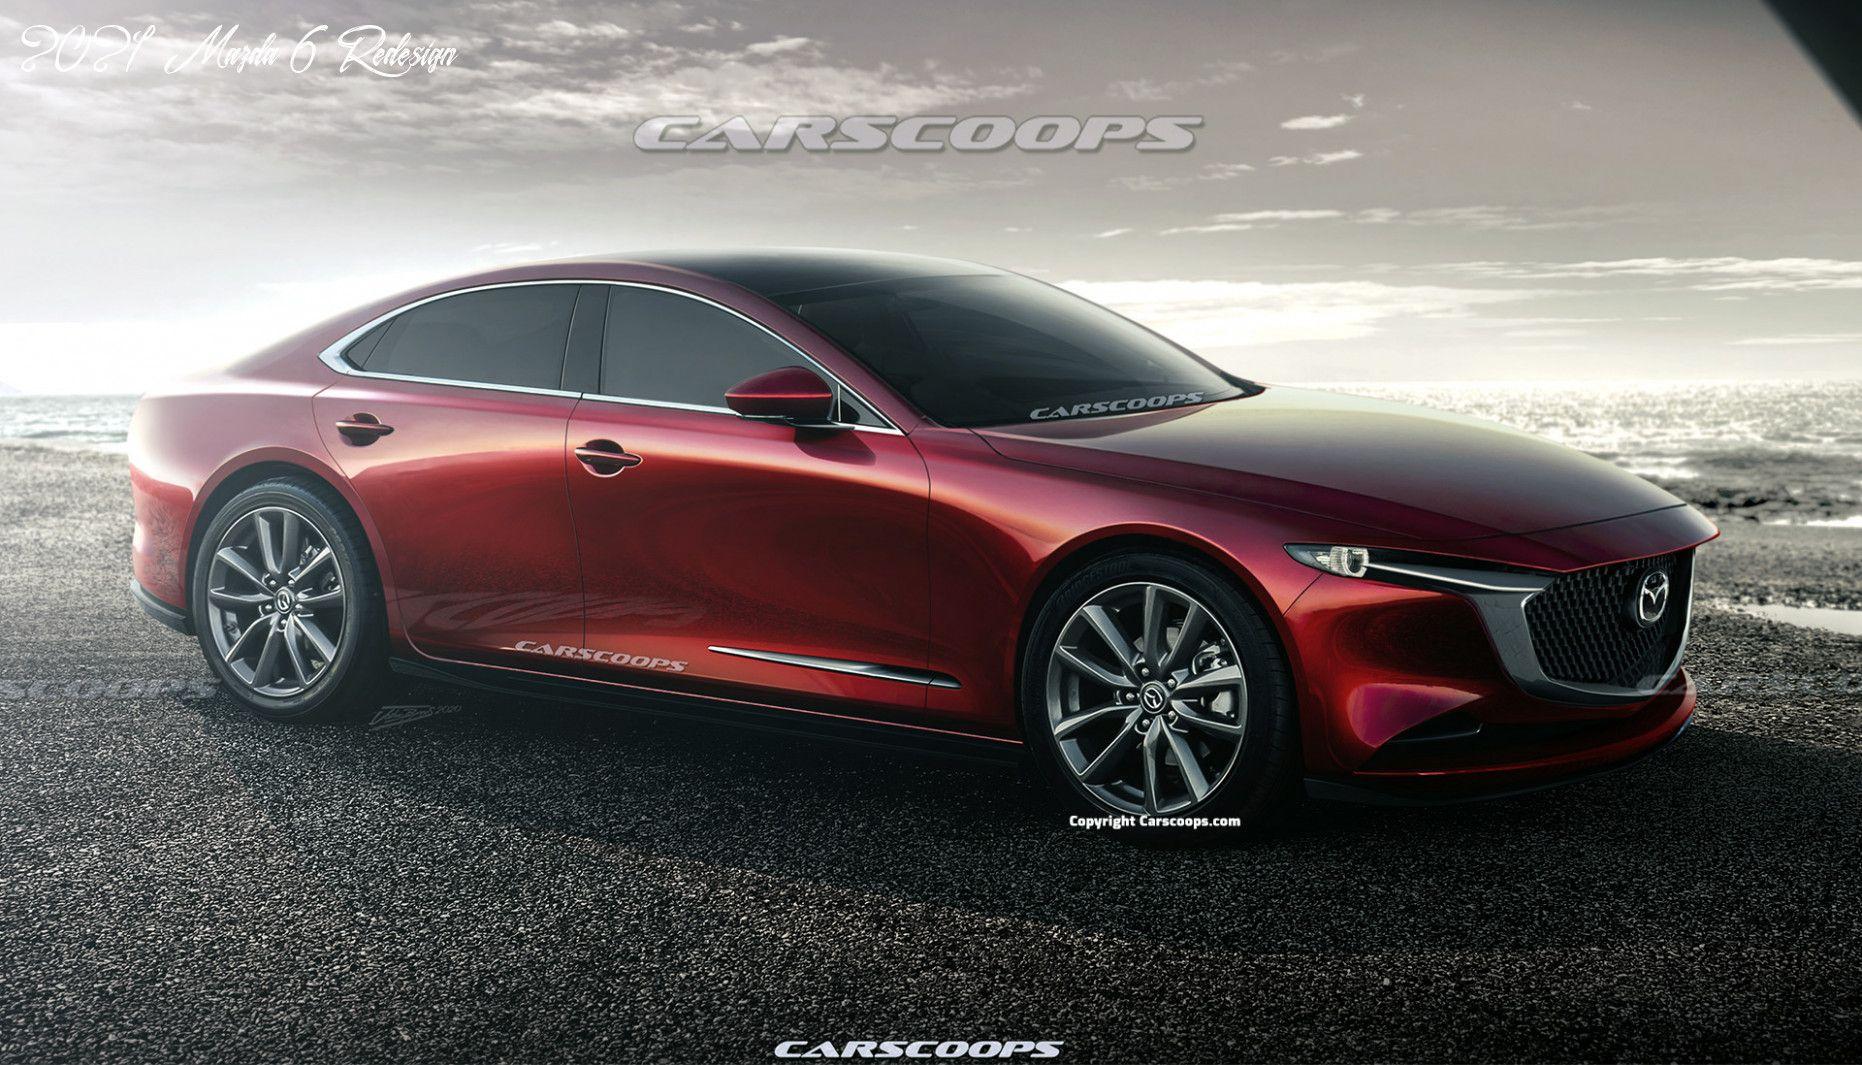 2021 Mazda 6 Redesign Performance And New Engine In 2020 Mazda Mazda 6 Bmw